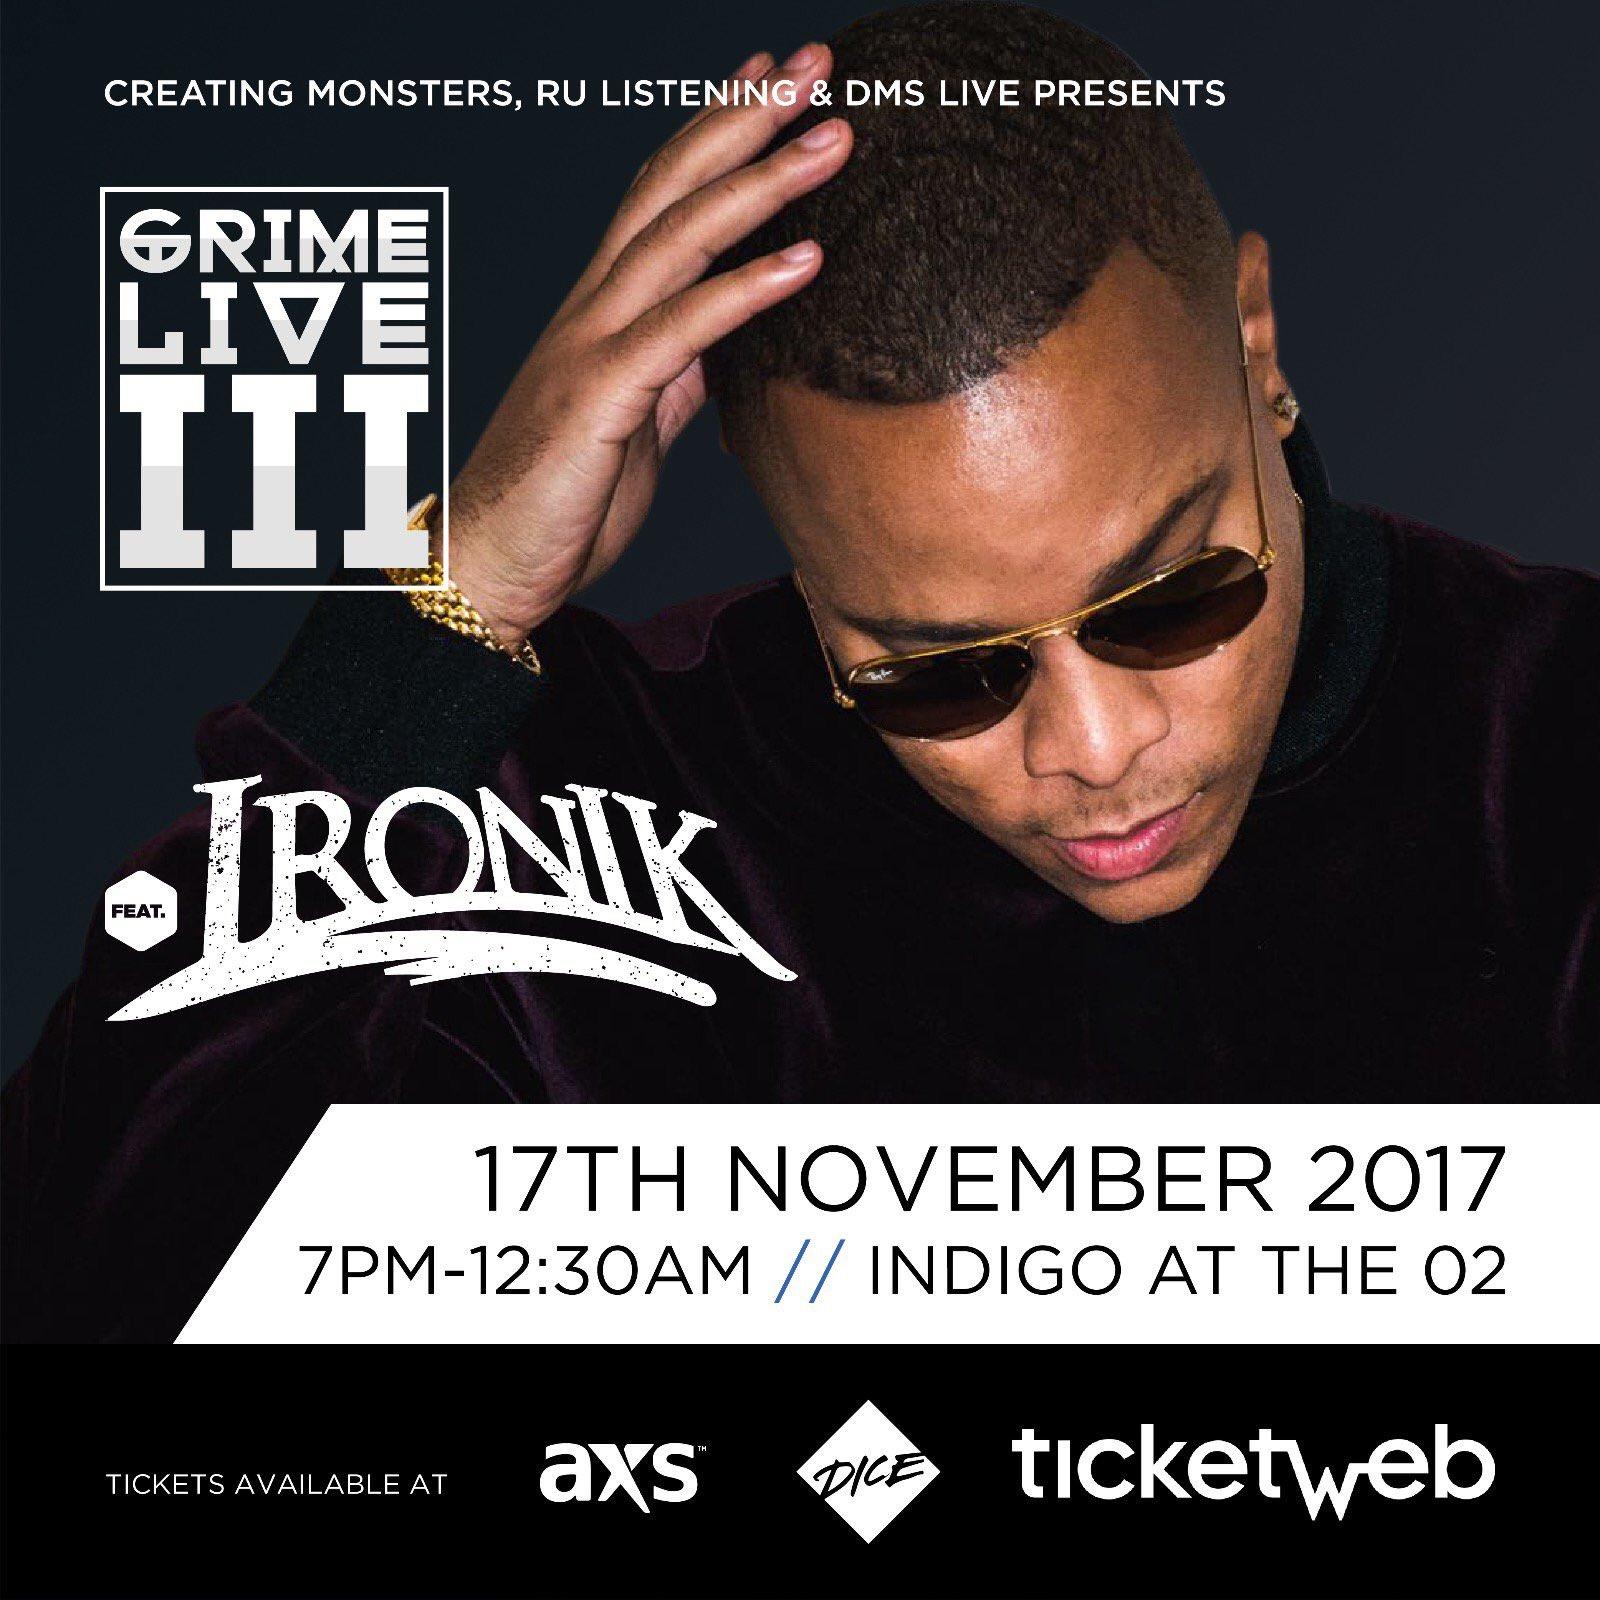 LONDON / GRIME LIVE III // NOV 17th // CATCH ME HOSTING @ INDIGO AT THE O2!  🎉🔉🔥 https://t.co/DCDL33BQwP